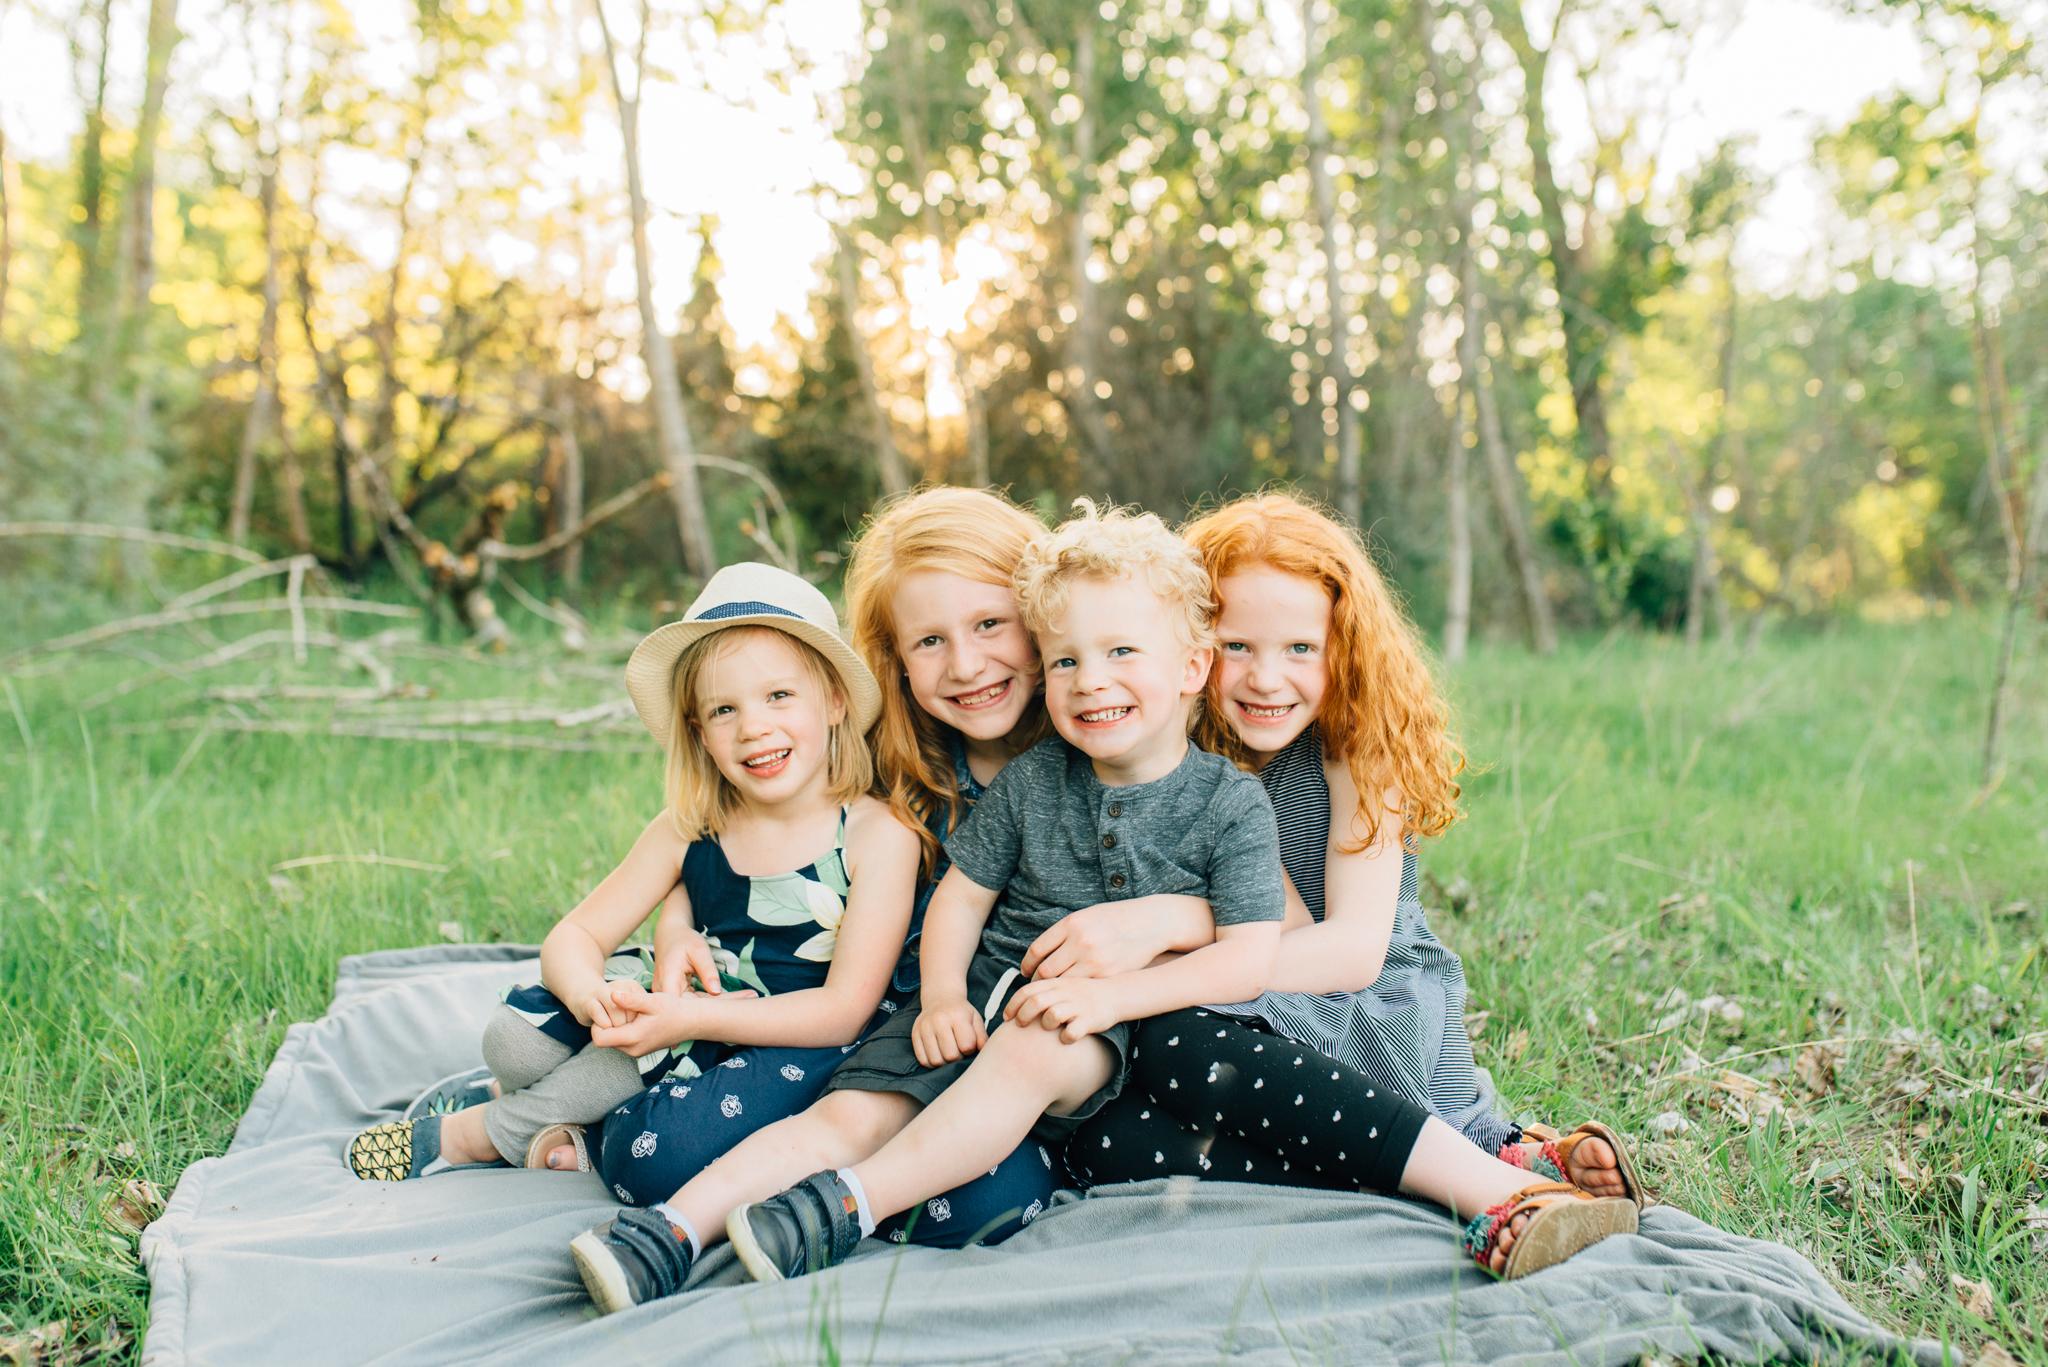 boise family lifestyle session| barber park | boise family photographer | siblings